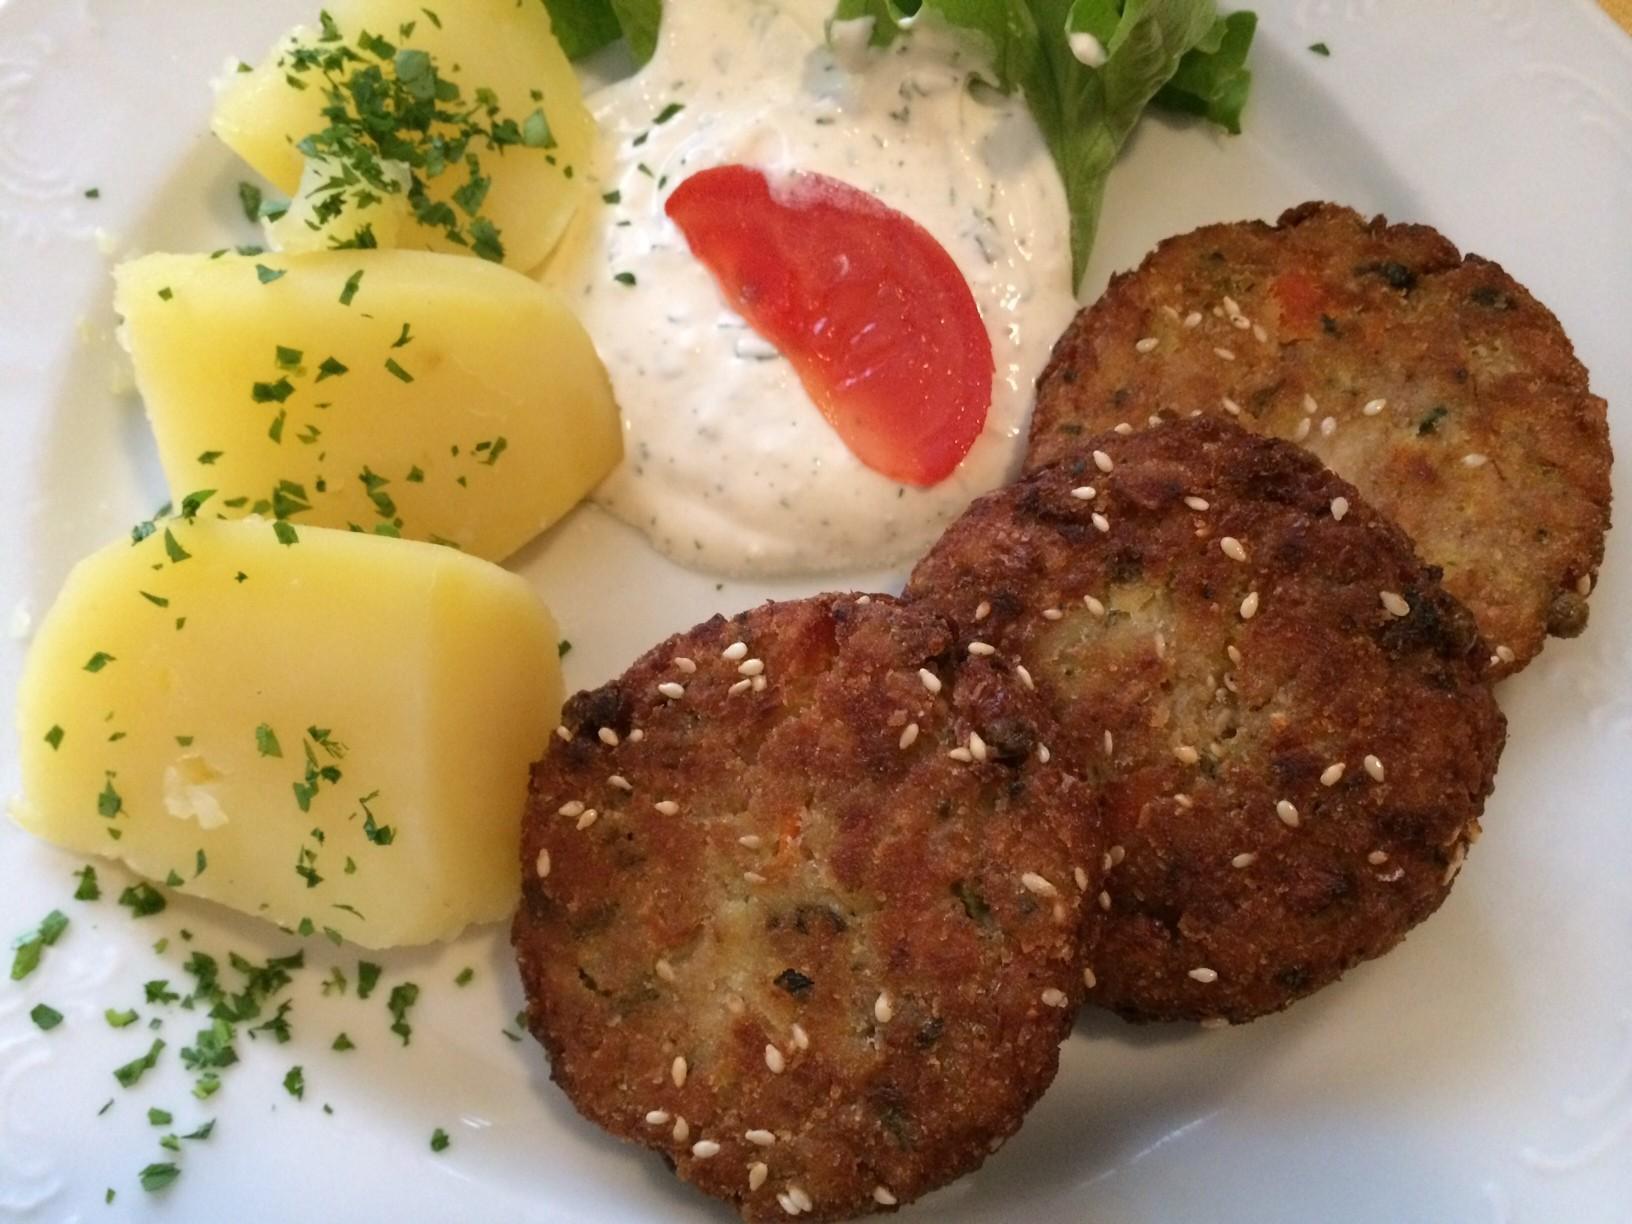 Gemüse-Hirse-Laibchen